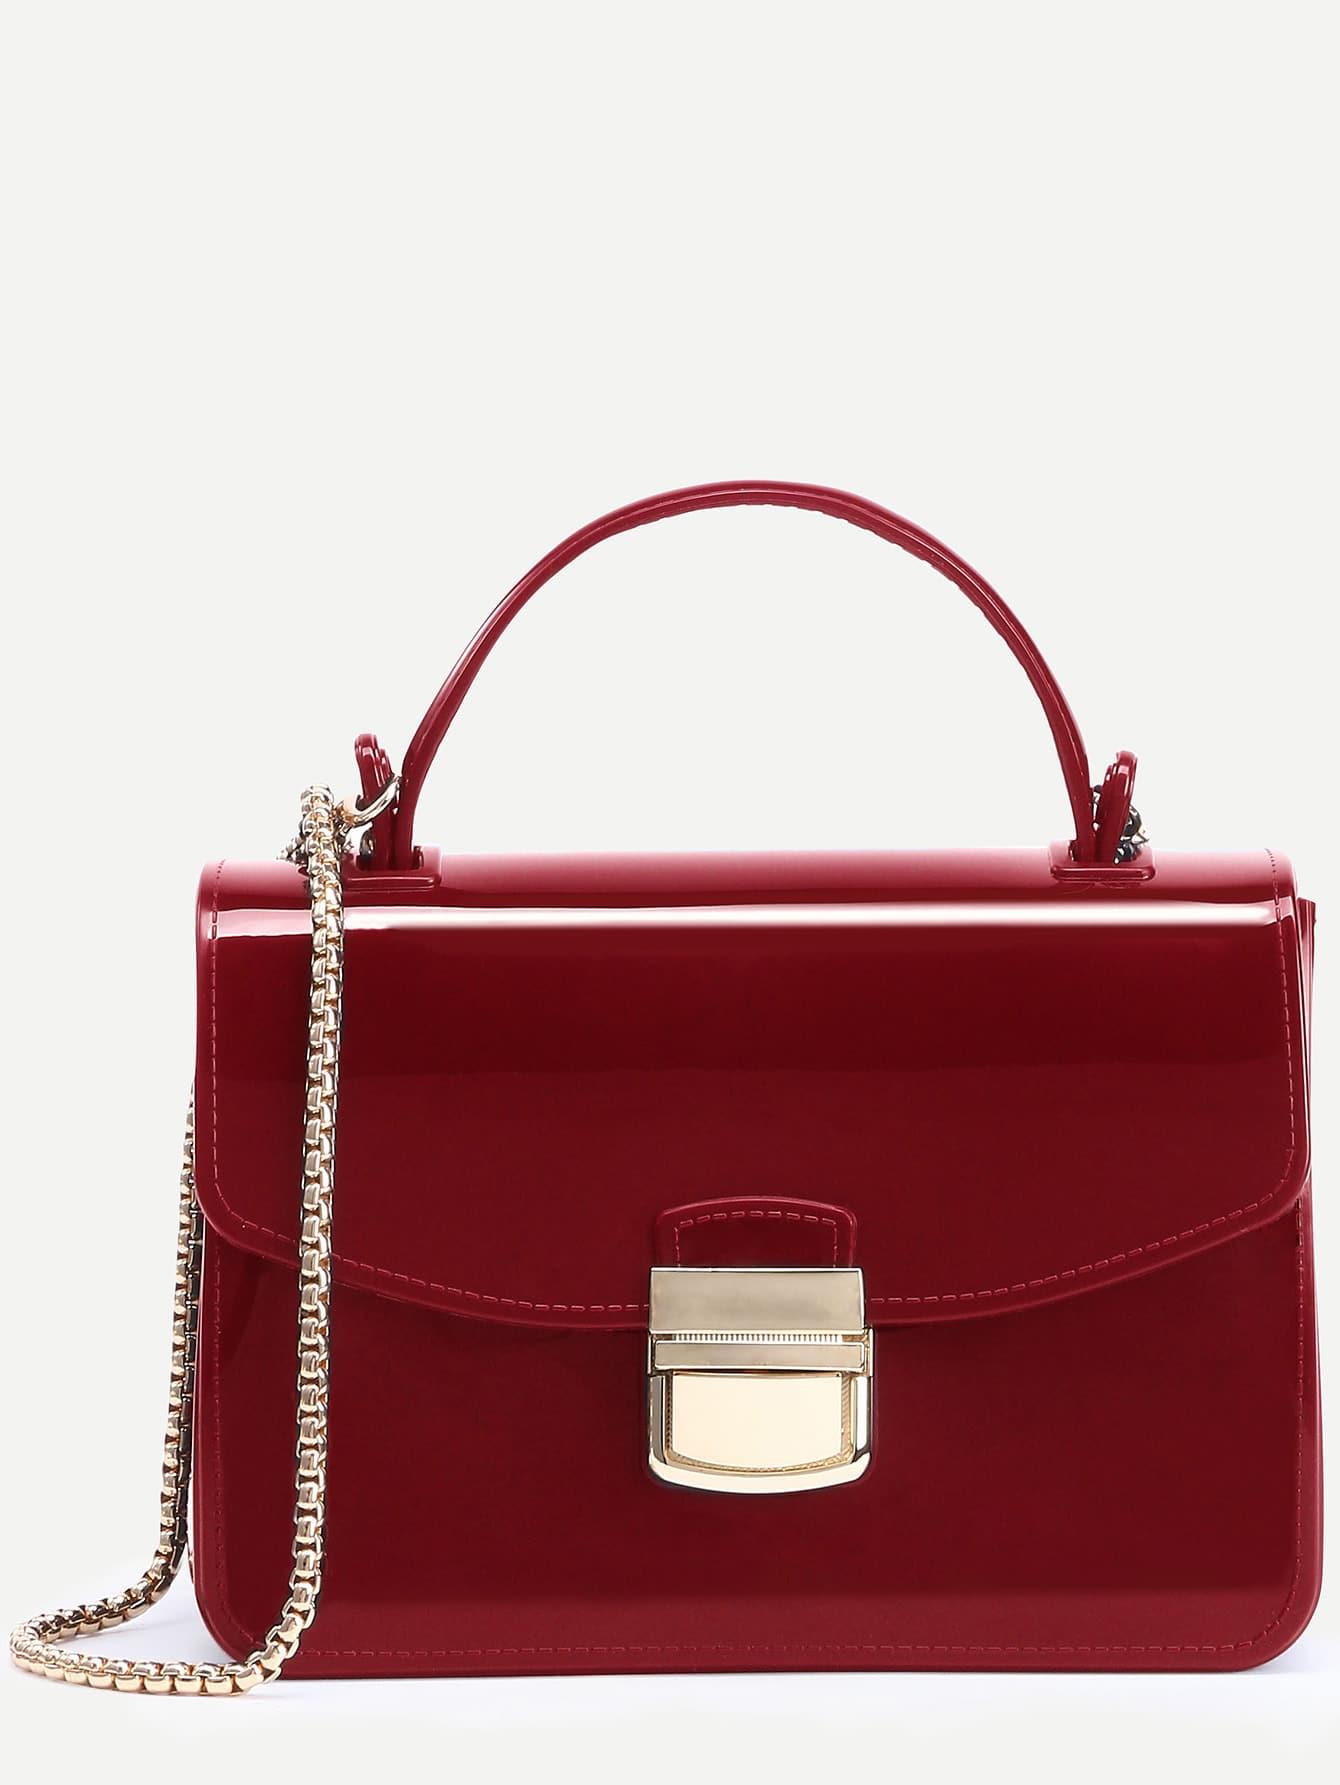 Pushlock Closure Plastic Handbag With Chain все цены